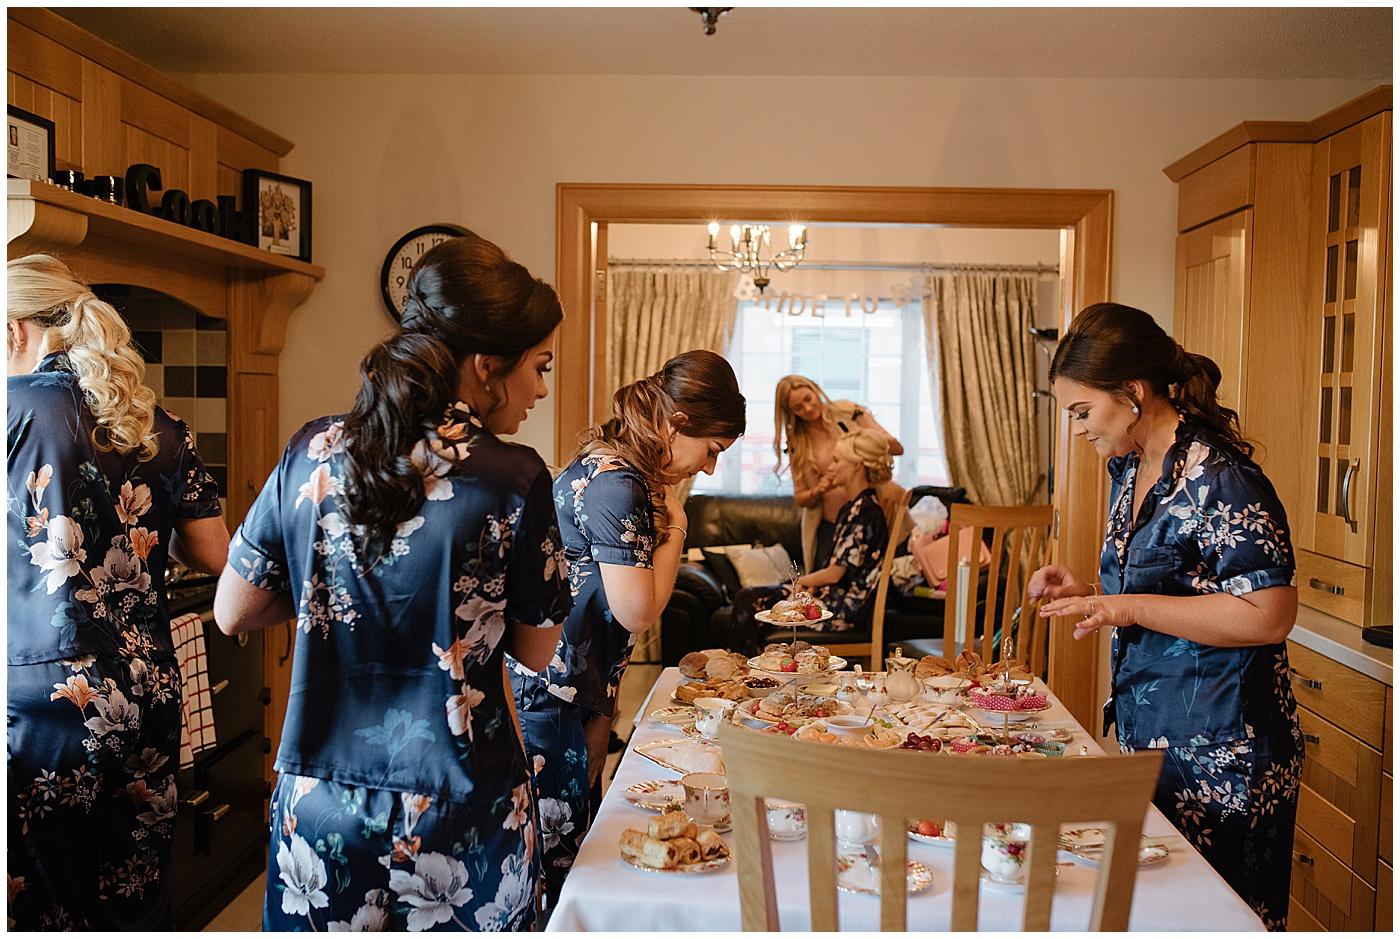 lissan-house-wedding-jude-browne-photography_0141.jpg